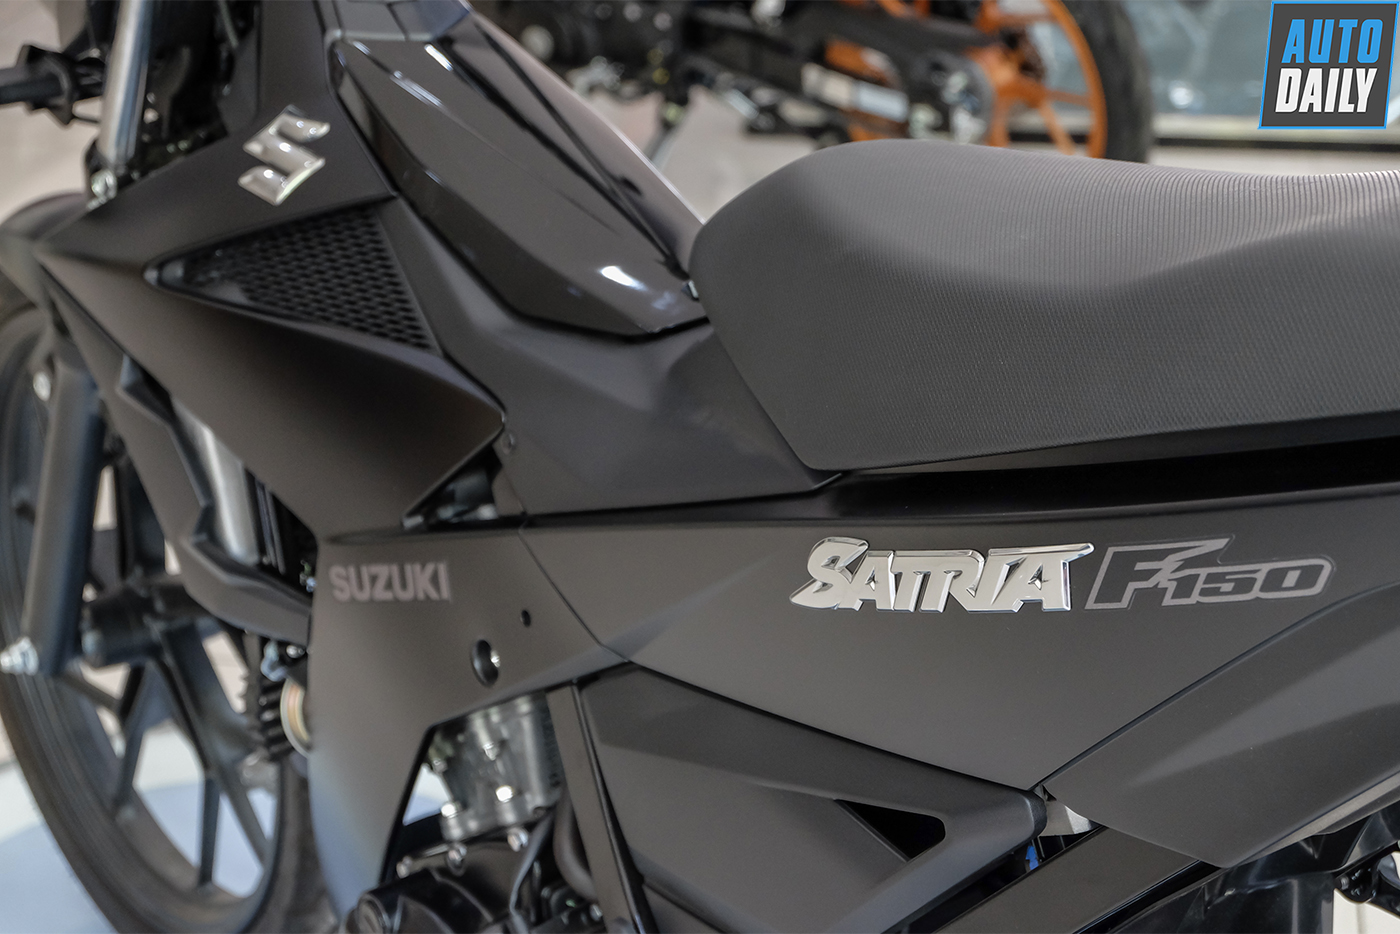 Chi tiết Suzuki Satria F150 nhập chính hãng có giá từ 51,99 triệu đồng suzuki-satria-f150-27.jpg